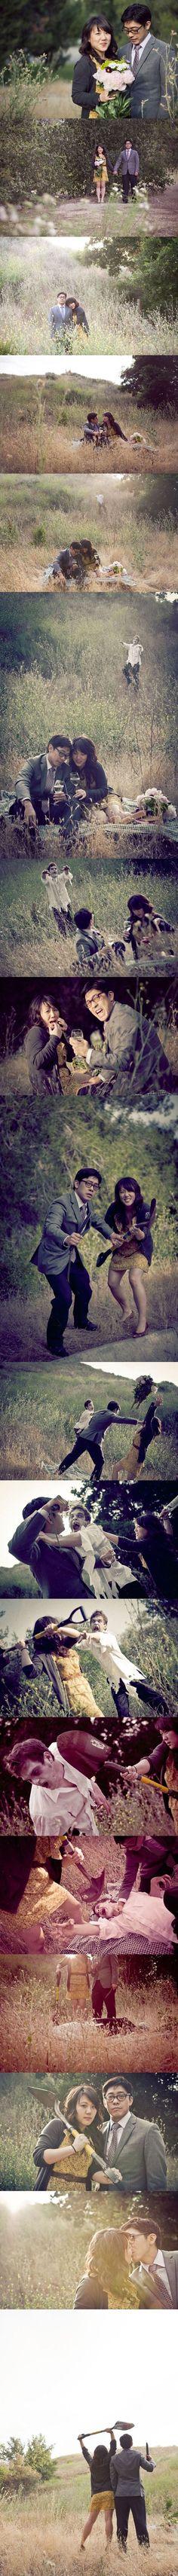 Zombie Wedding Photographs